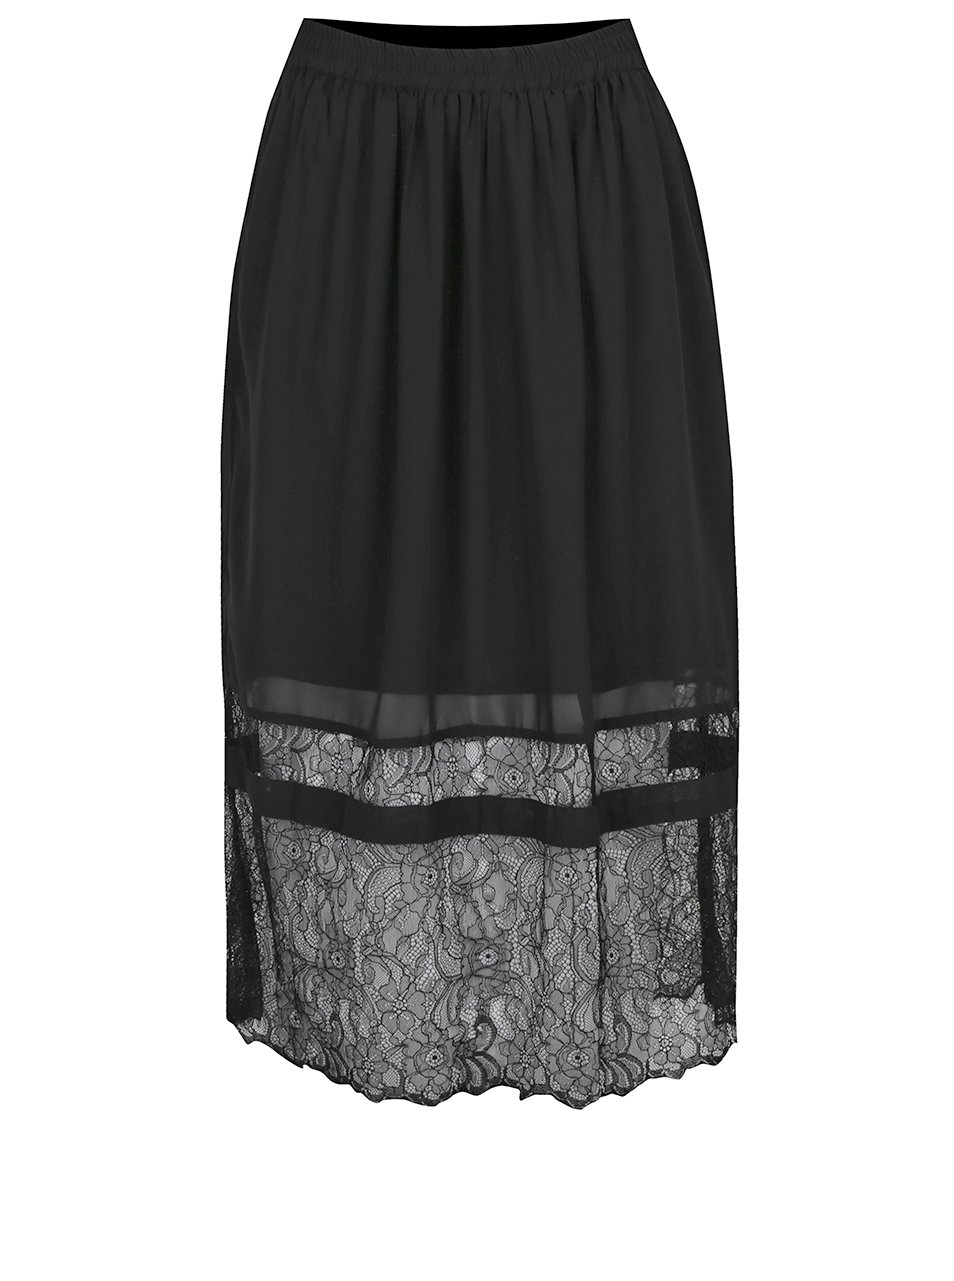 Černá midi sukně s krajkovými detaily VILA Dede